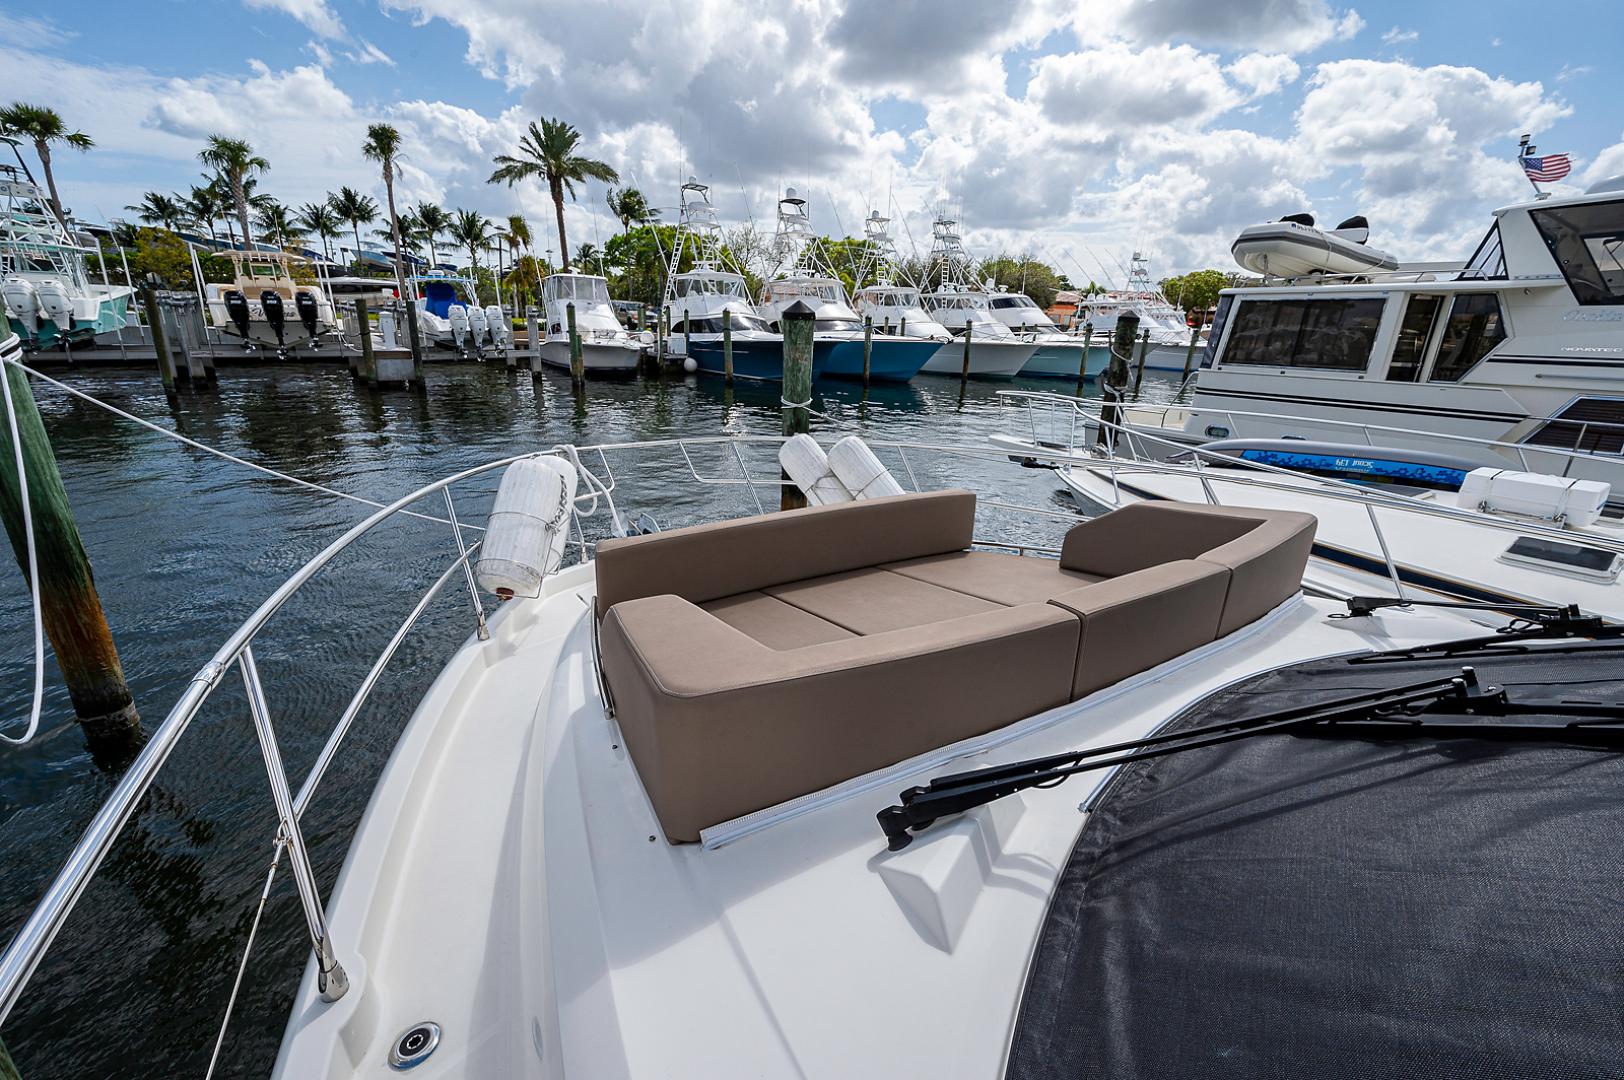 Prestige-460 Flybridge 2018-SEAQUEL Palm Beach Gardens-Florida-United States-Bow-1351146 | Thumbnail